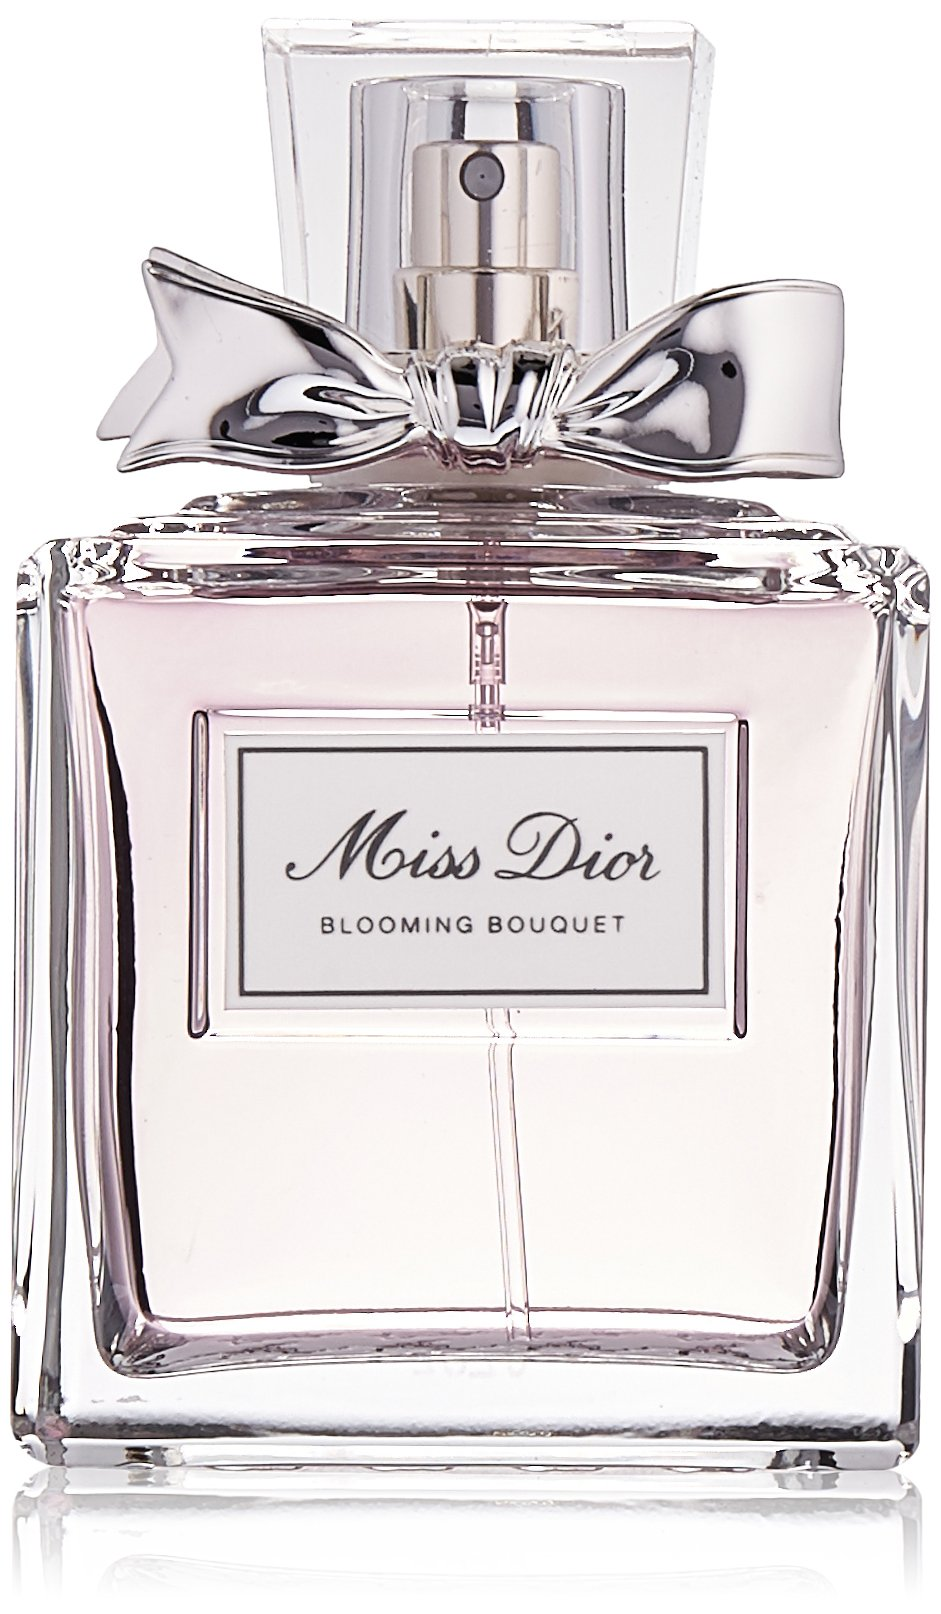 241b479a592 Christian Dior Miss Dior Blooming Bouquet Eau De Toilette Spray for Women